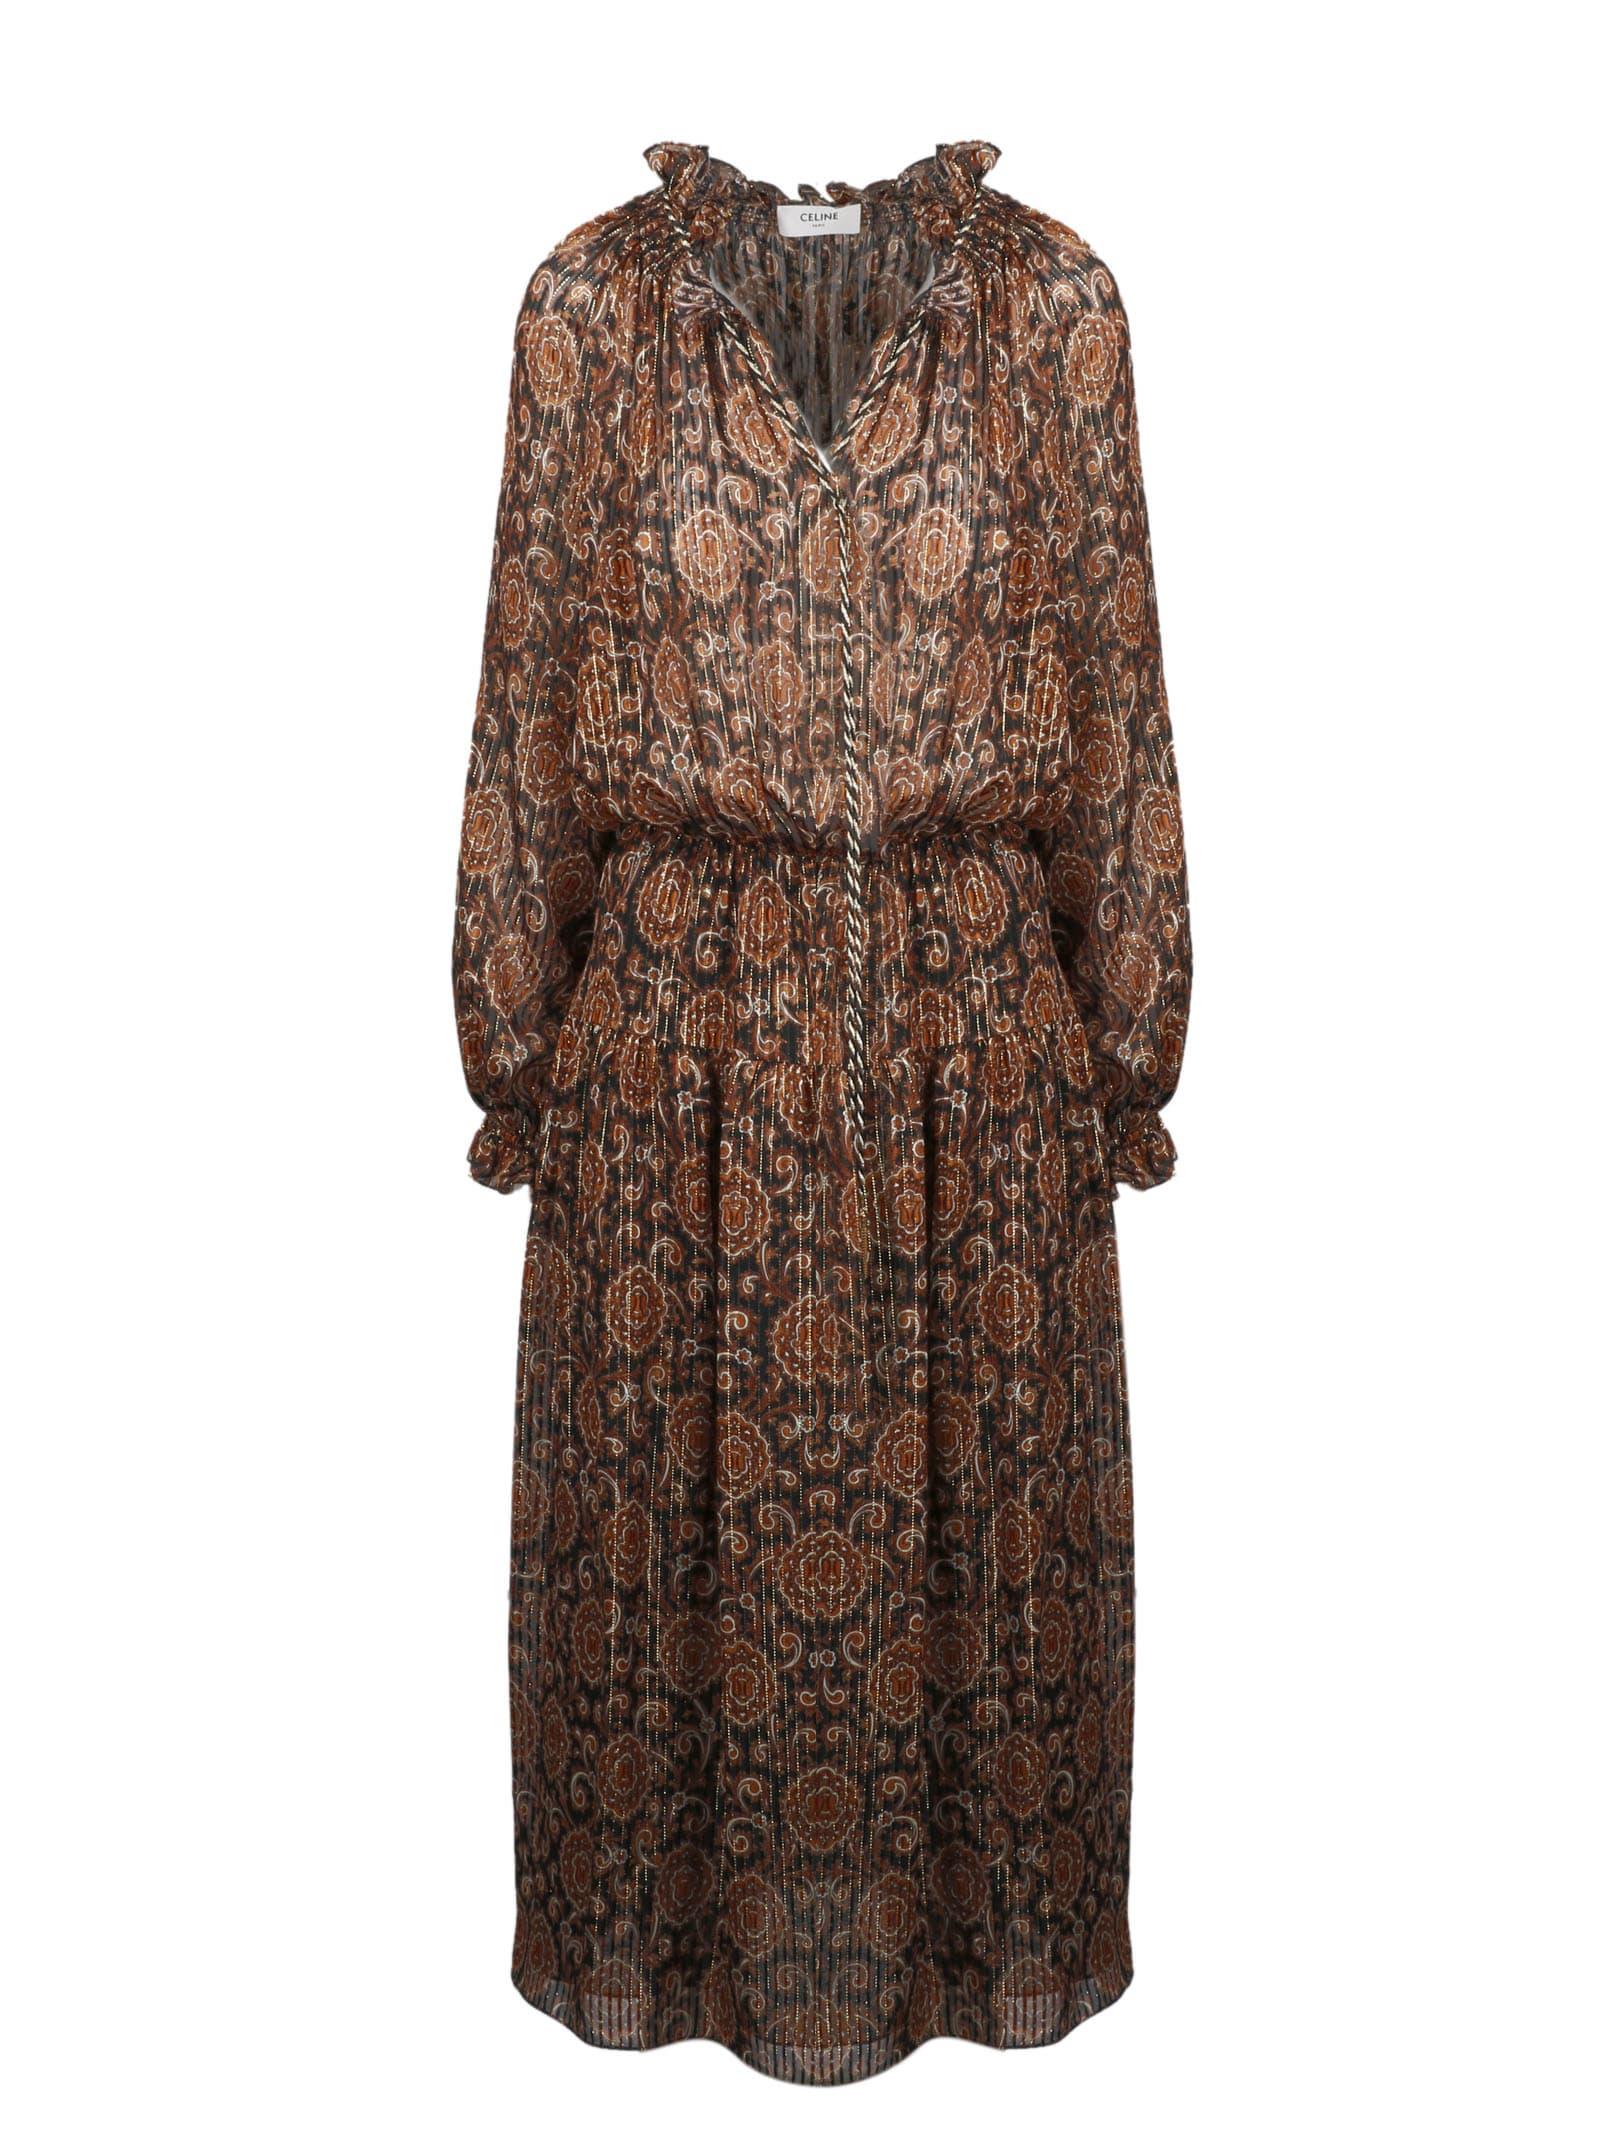 Buy Celine Printed Silk Lamé Folk Dress online, shop Celine with free shipping